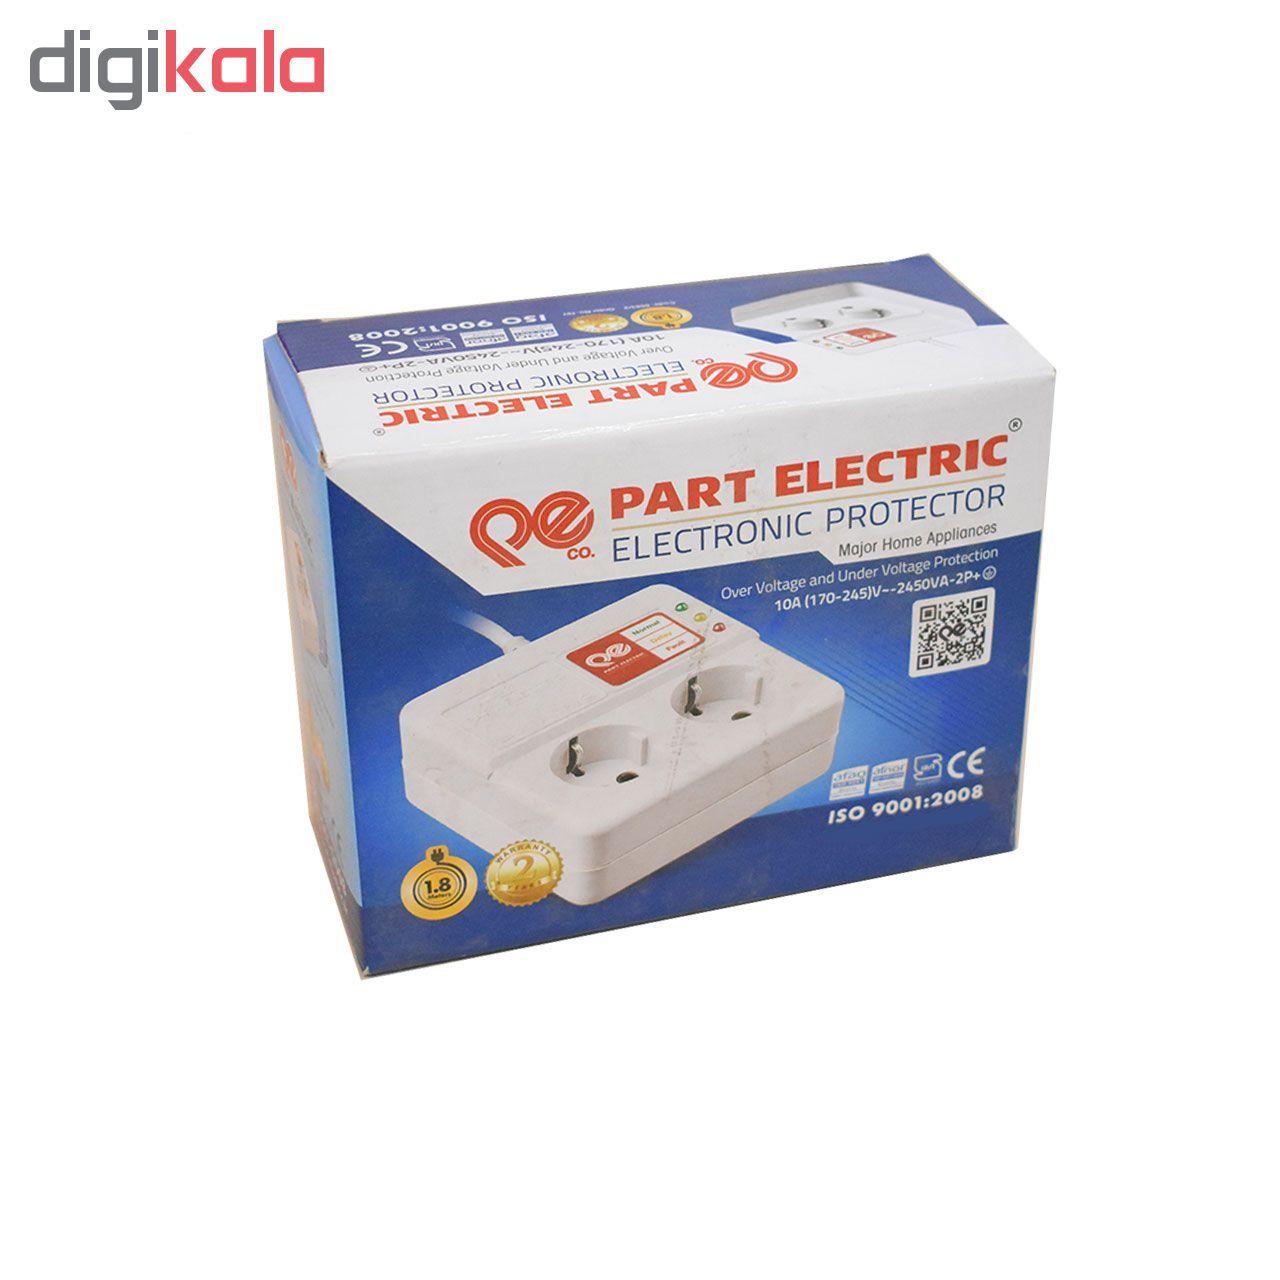 محافظ ولتاژ آنالوگ پارت الکتریک مدل Major home appliances main 1 3